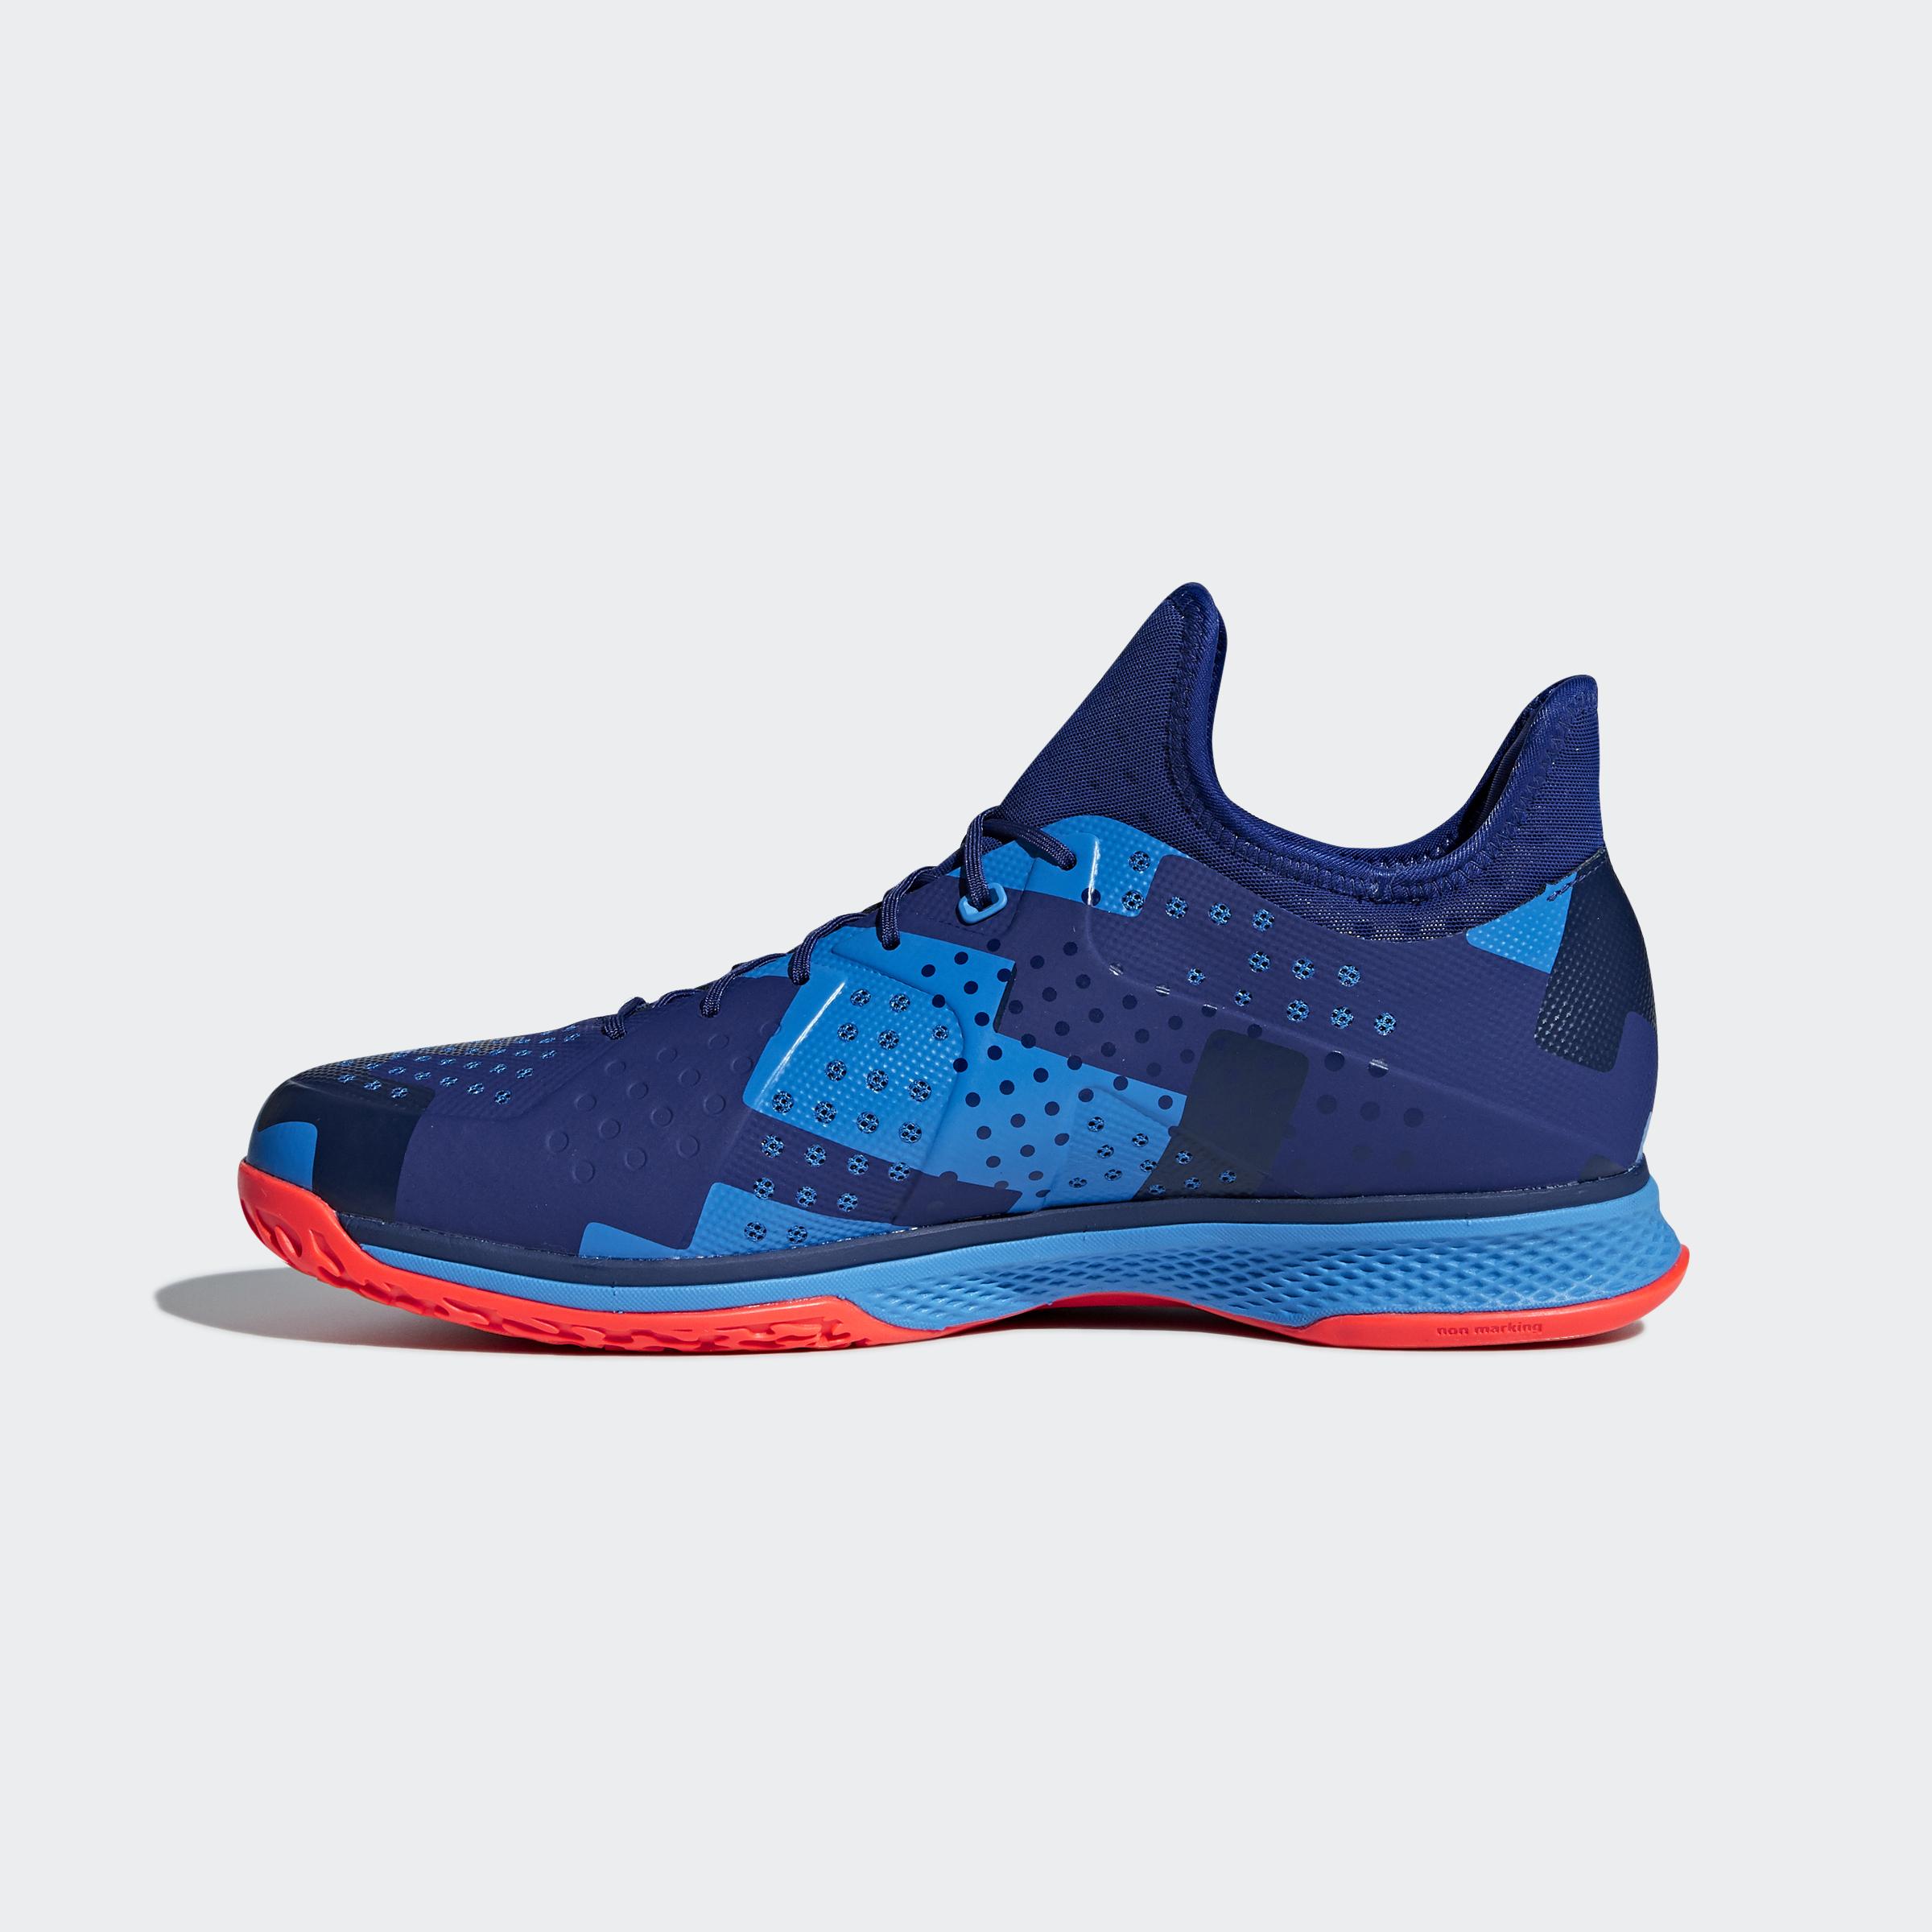 newest e5473 a29c9 Adidas - Counterblast Bounce Shoes - 7